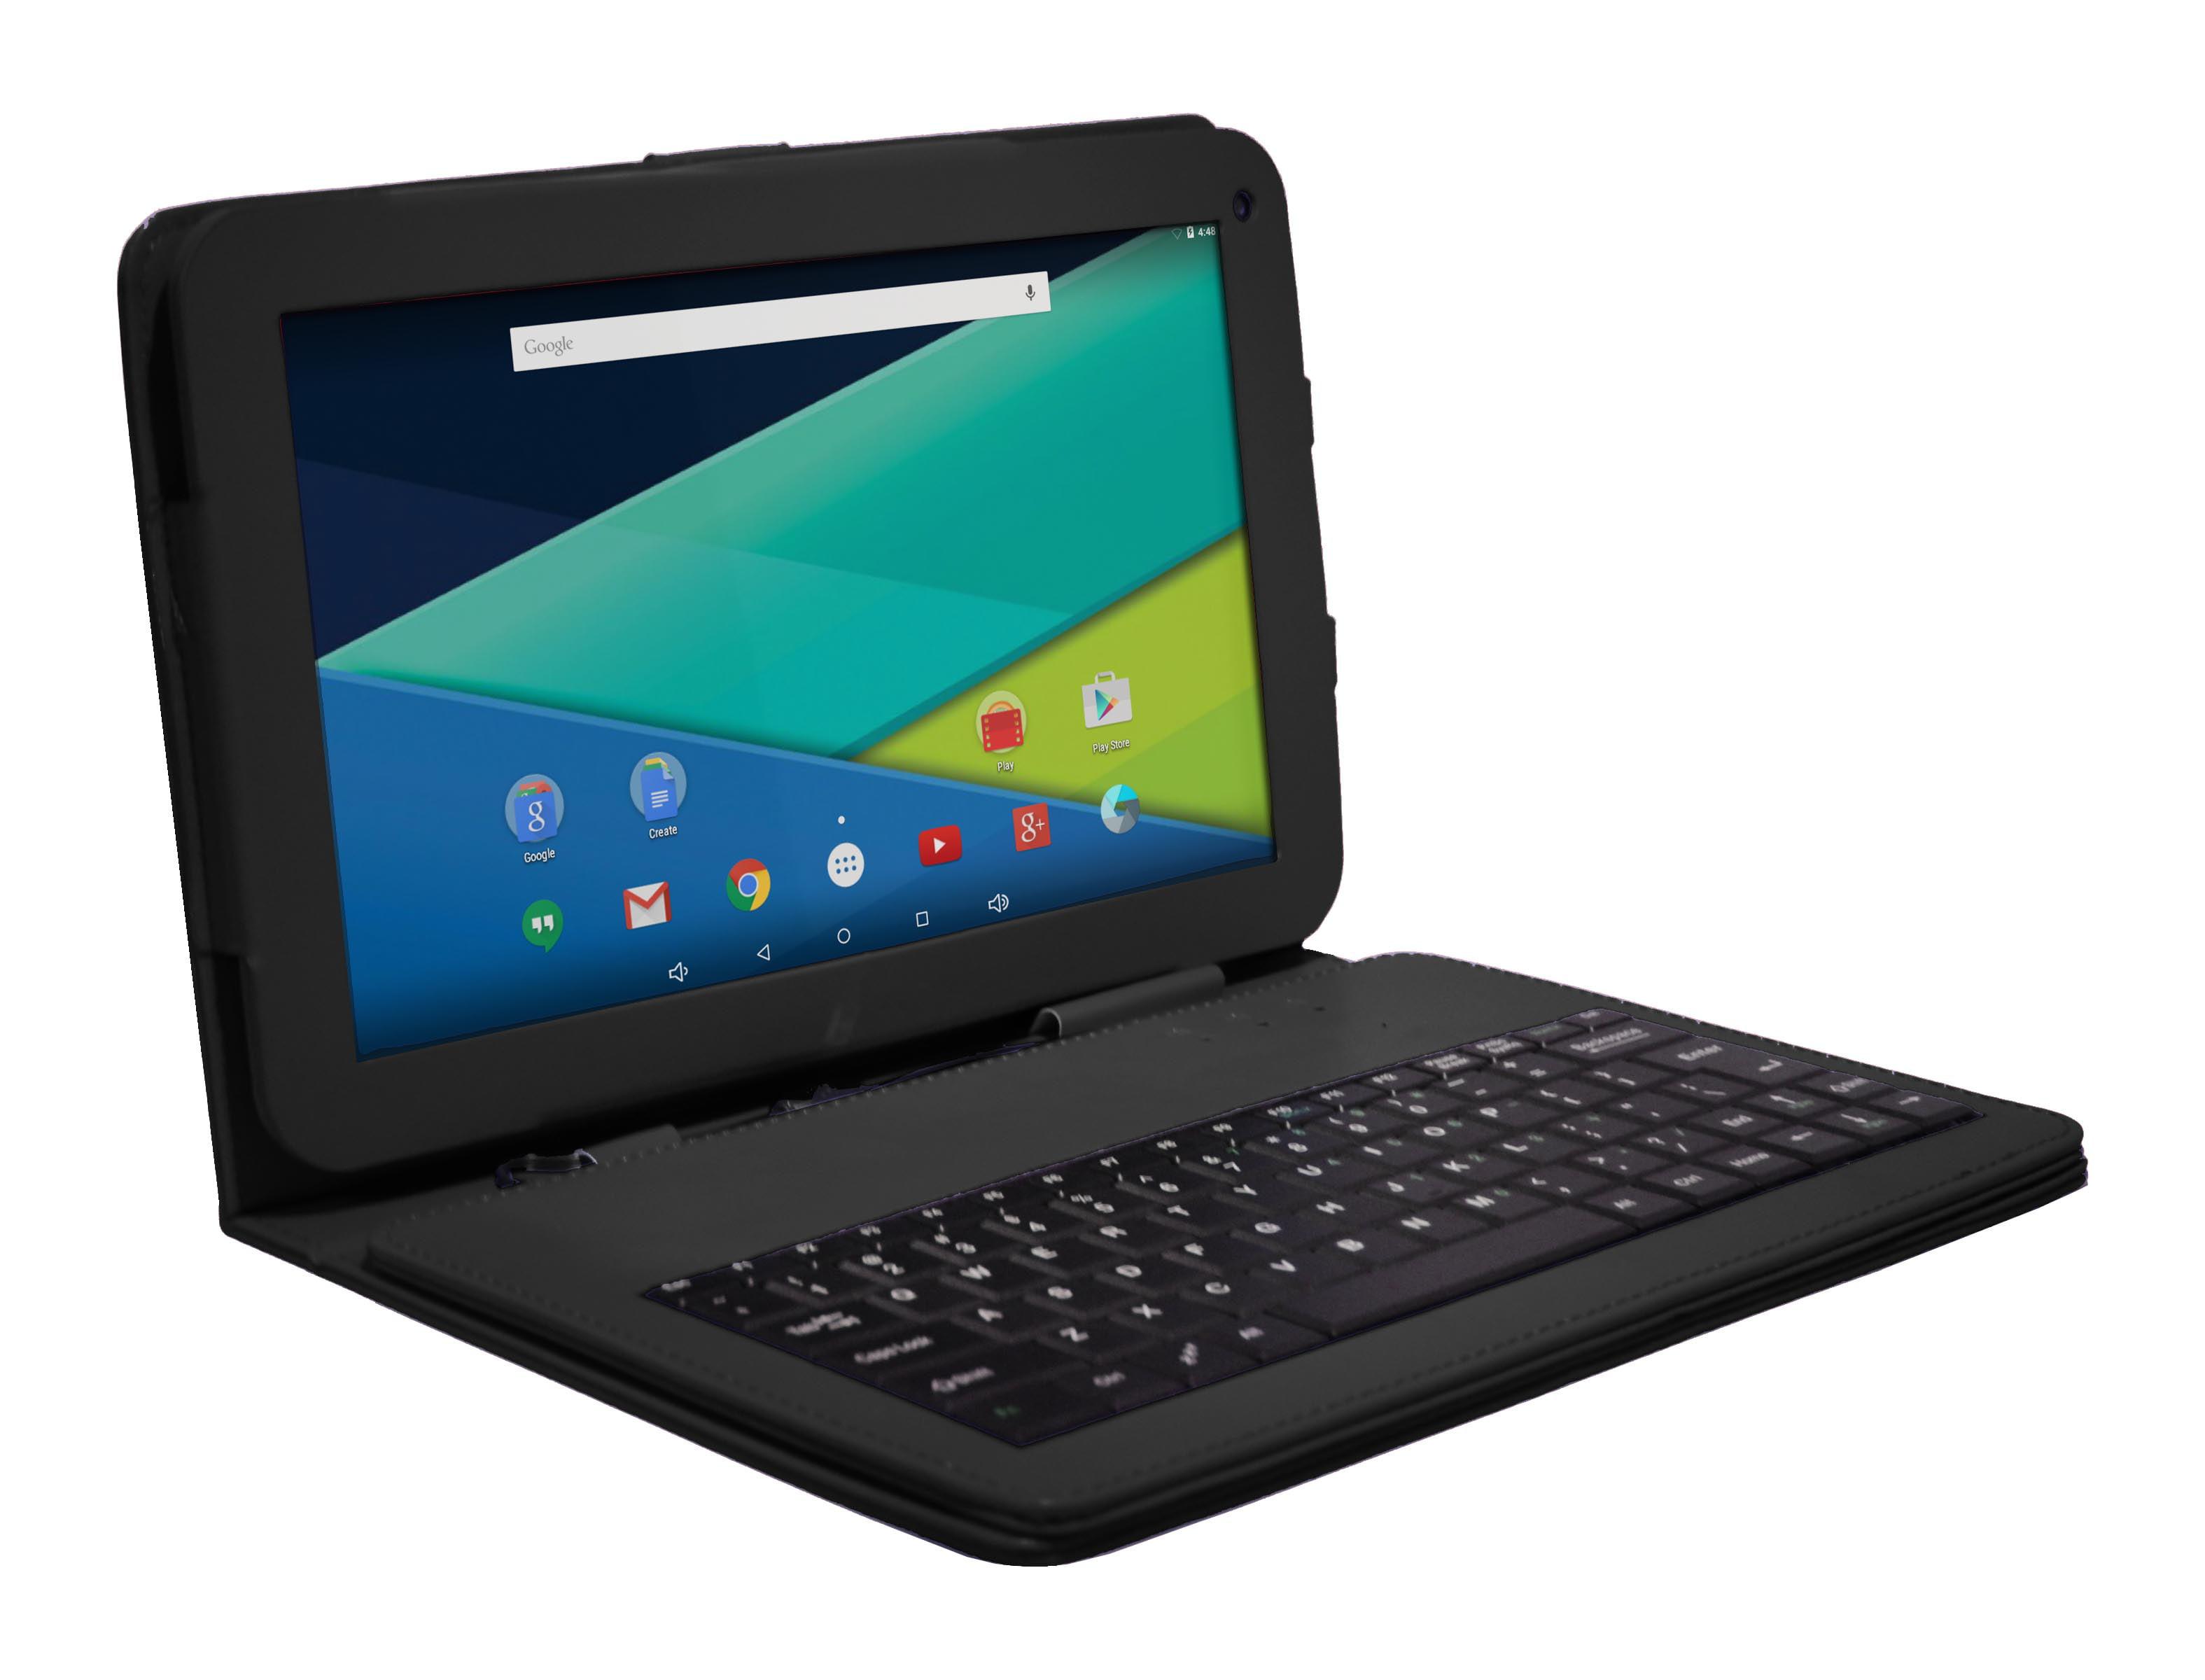 "Visual Land Prestige 10.1"" Quad Core Tablet 16GB Includes"